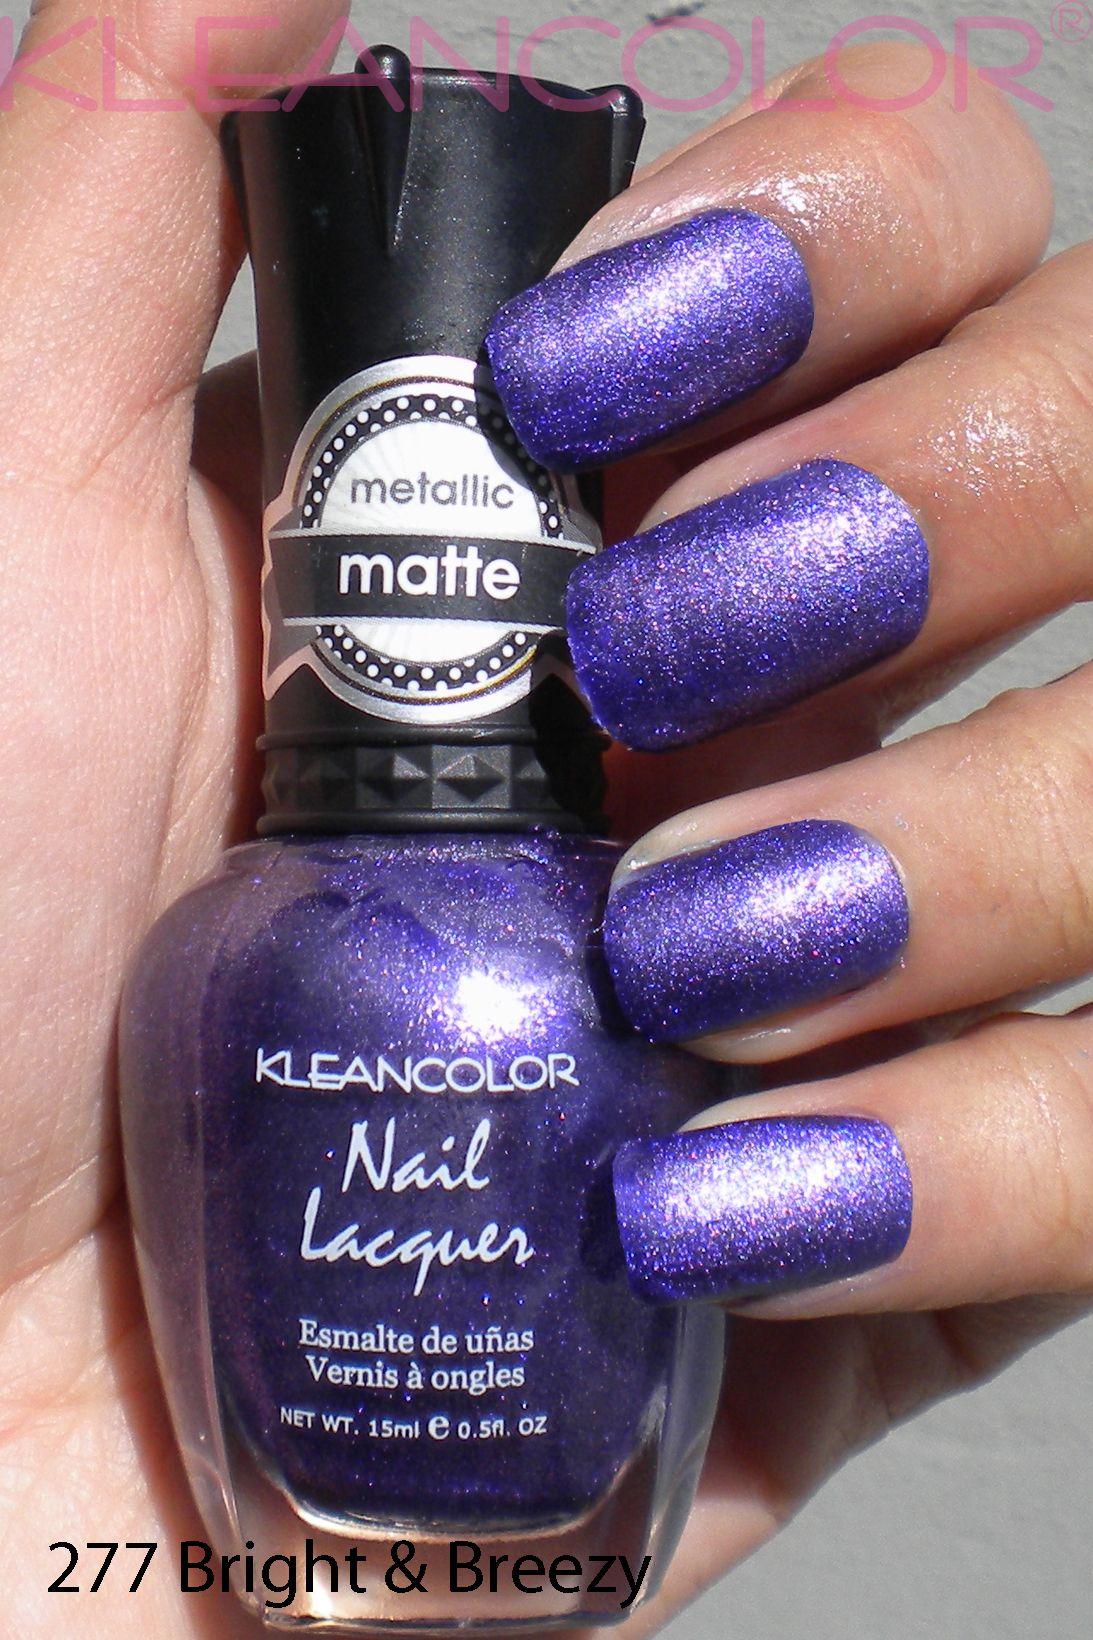 277 Bright & Breezy #mattepolish #matte #polish | Matte Nail Lacquer ...